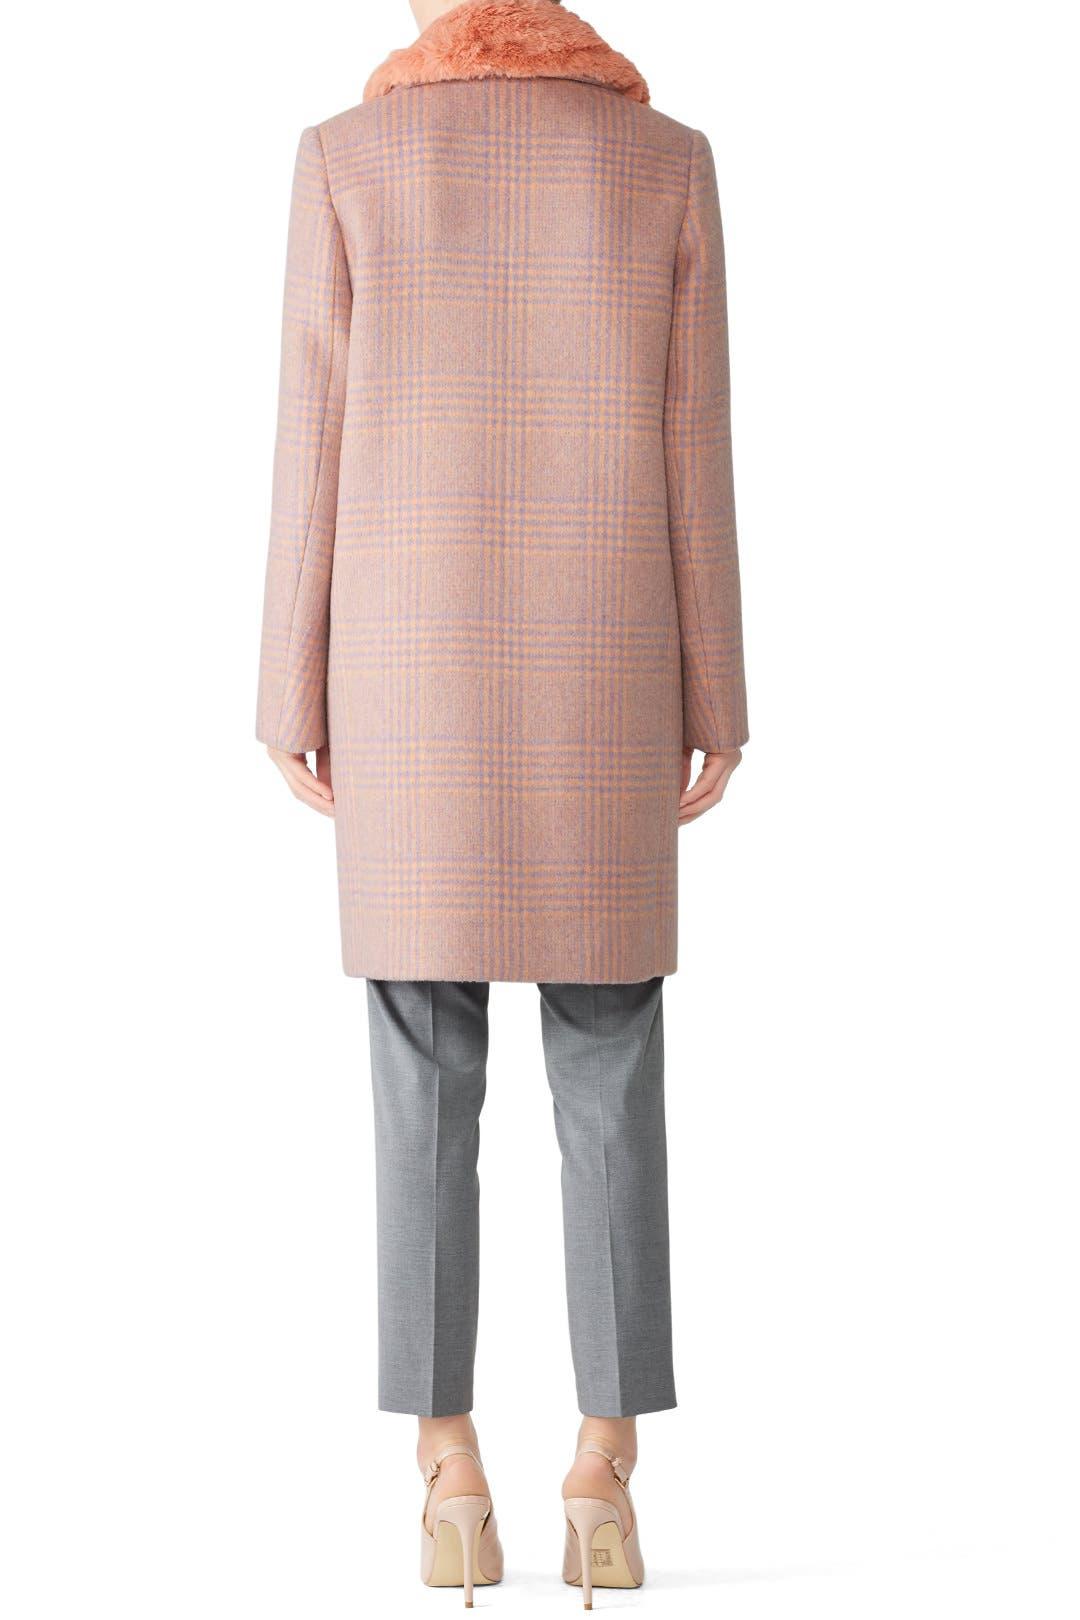 2f2bd53f67 Pink Plaid Coat by Tara Jarmon for  135